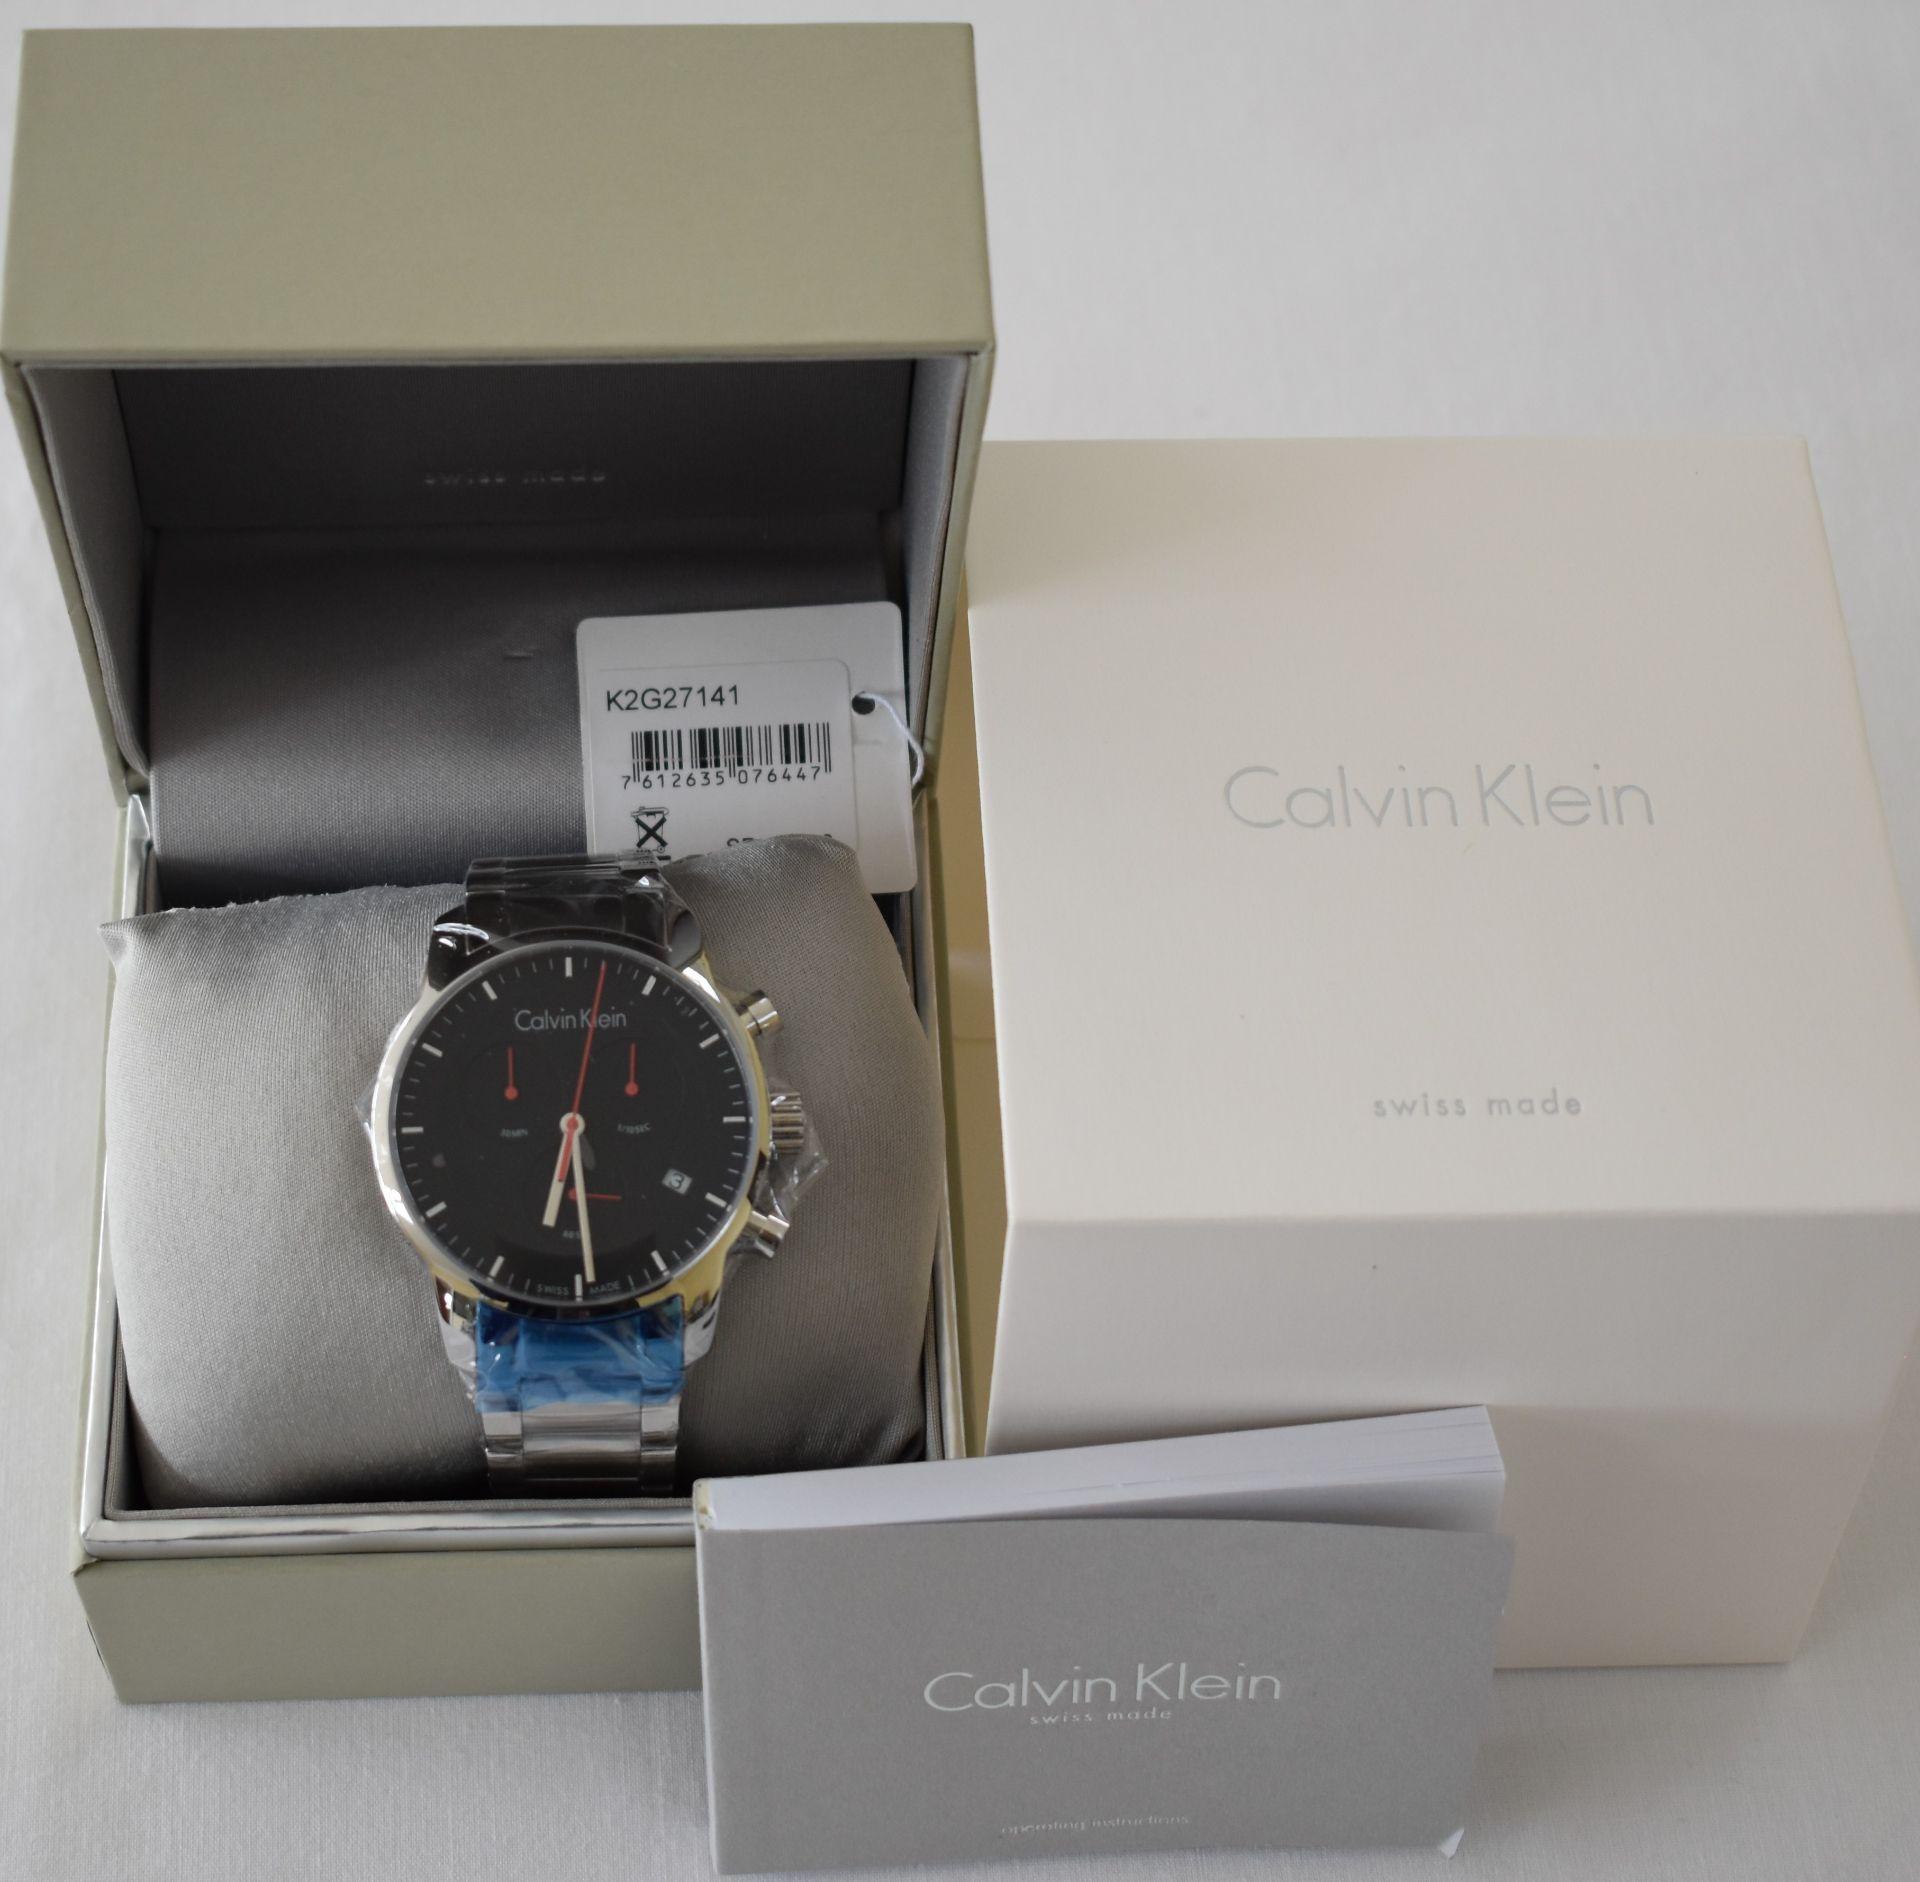 Calvin klein K2G27141 Men's Watch - Image 2 of 2